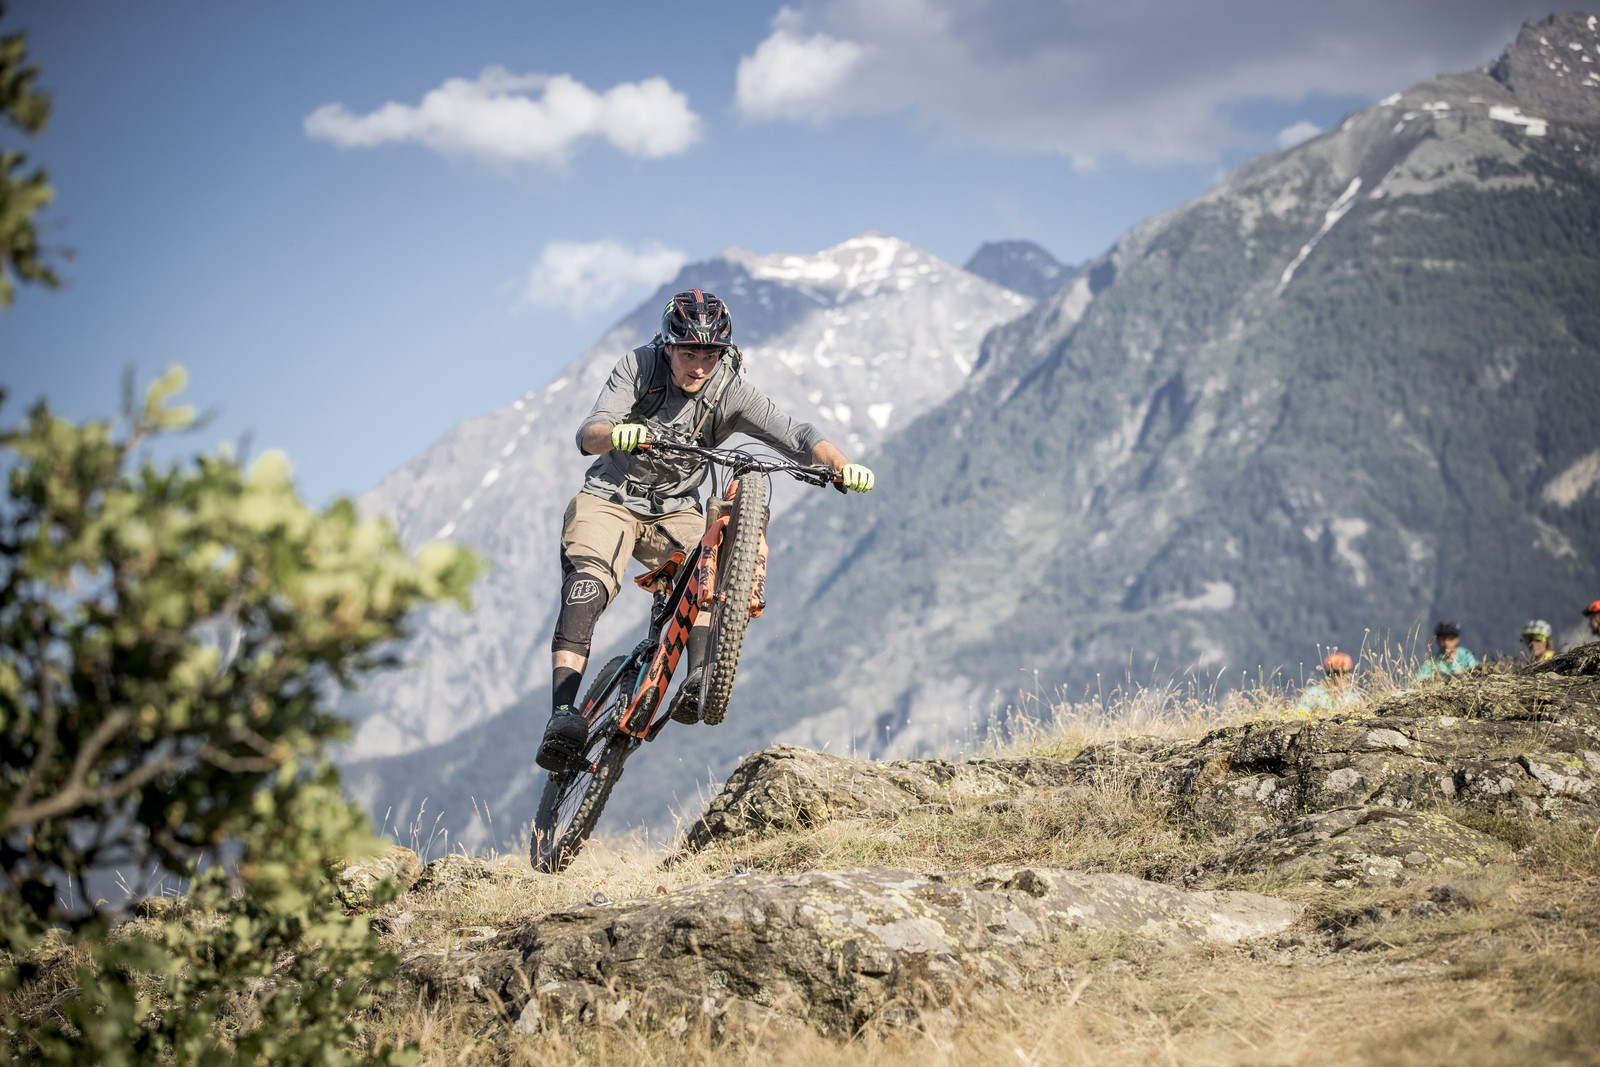 Brendan shredding the new Scott Genius in Aosta Valley, Italy.